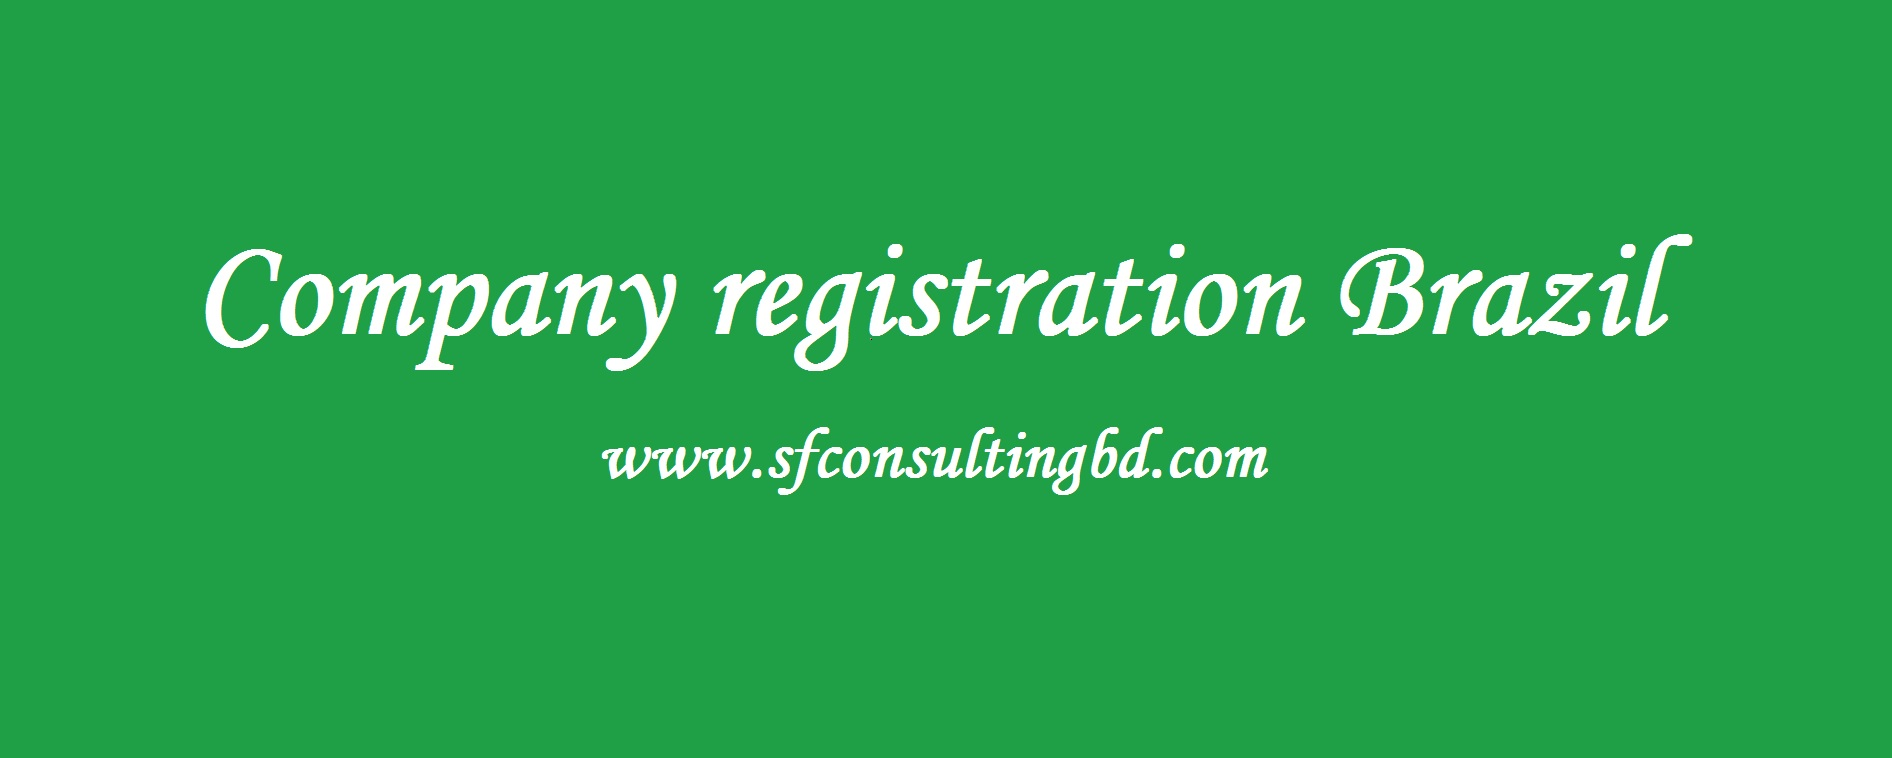 "<img src=""image/Company-registration-Brazil.jpg"" alt=""Company registration Brazil""/>"